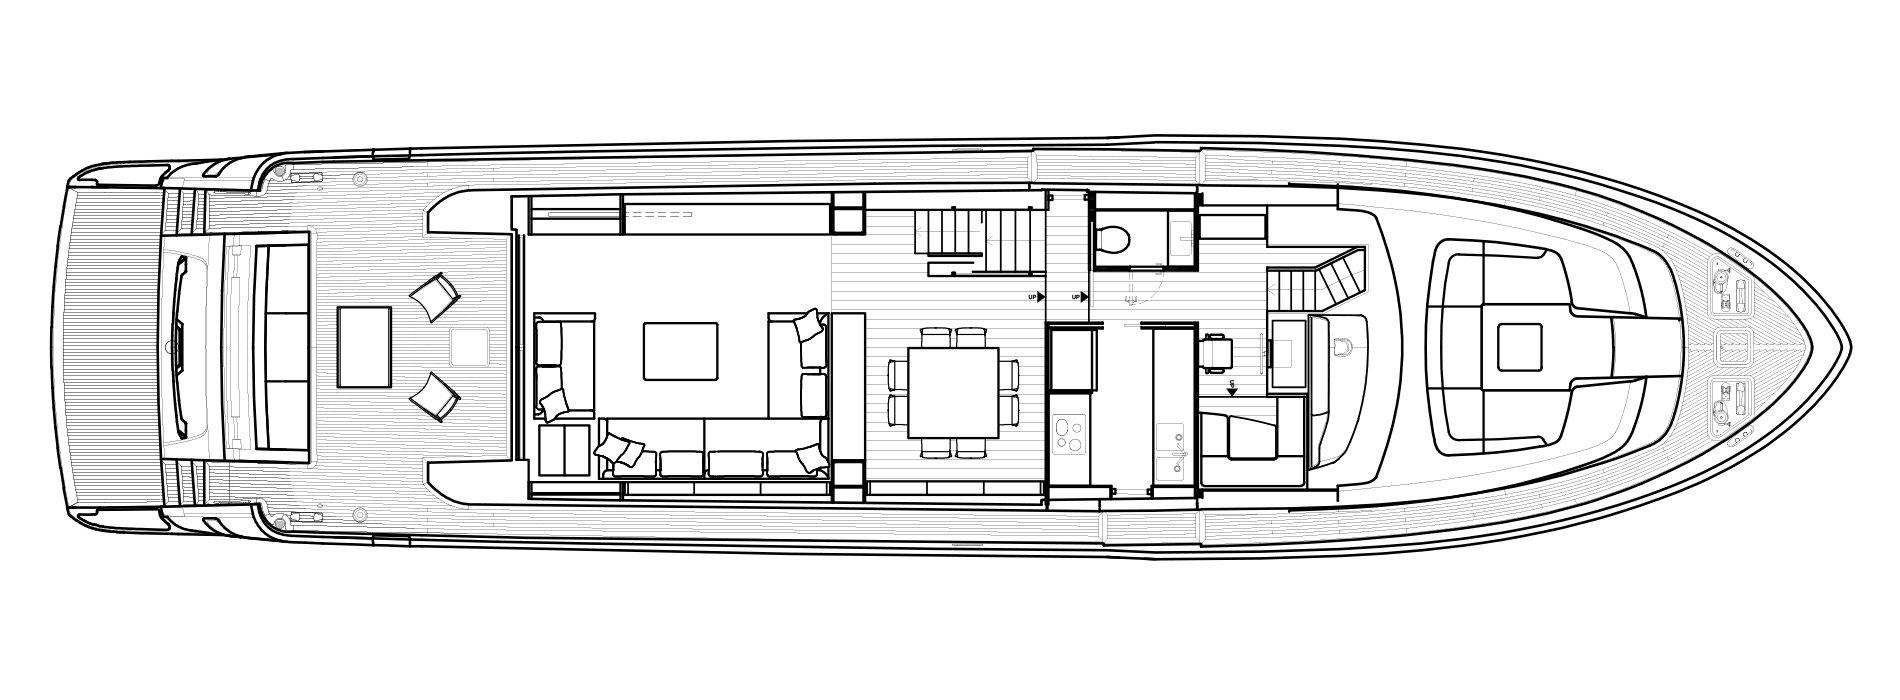 Sanlorenzo Yachts SL86 Pont principal Versione A